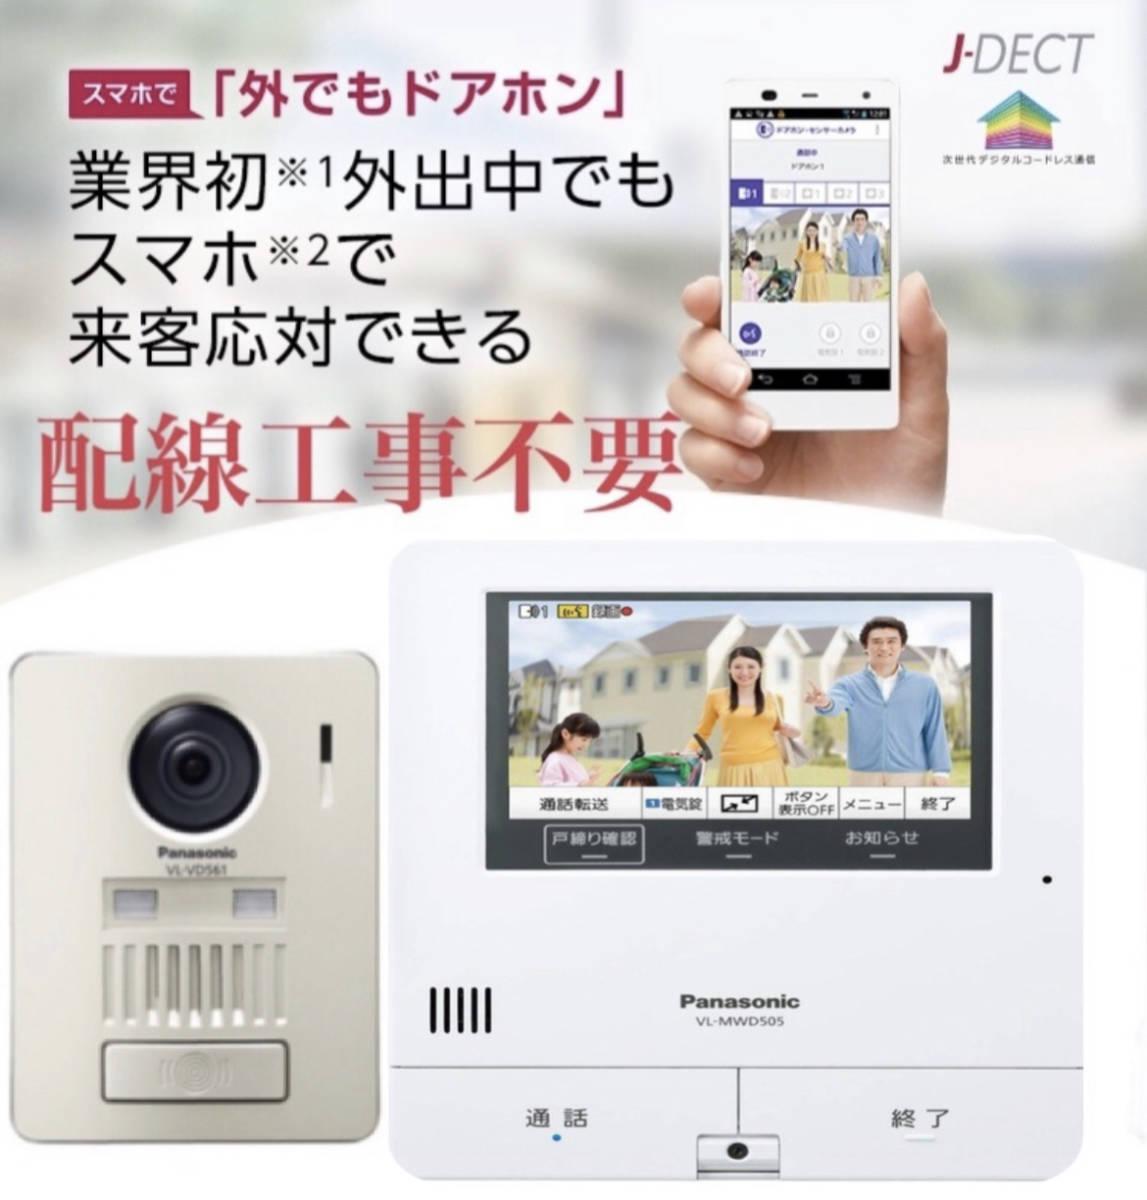 ★VL-SWH505KF★とカラーカメラ玄関子機 VL-VD561L-N Panasonic大画面テレビワイヤレスモニタースマホで来客応対可能 パナソニック_画像10